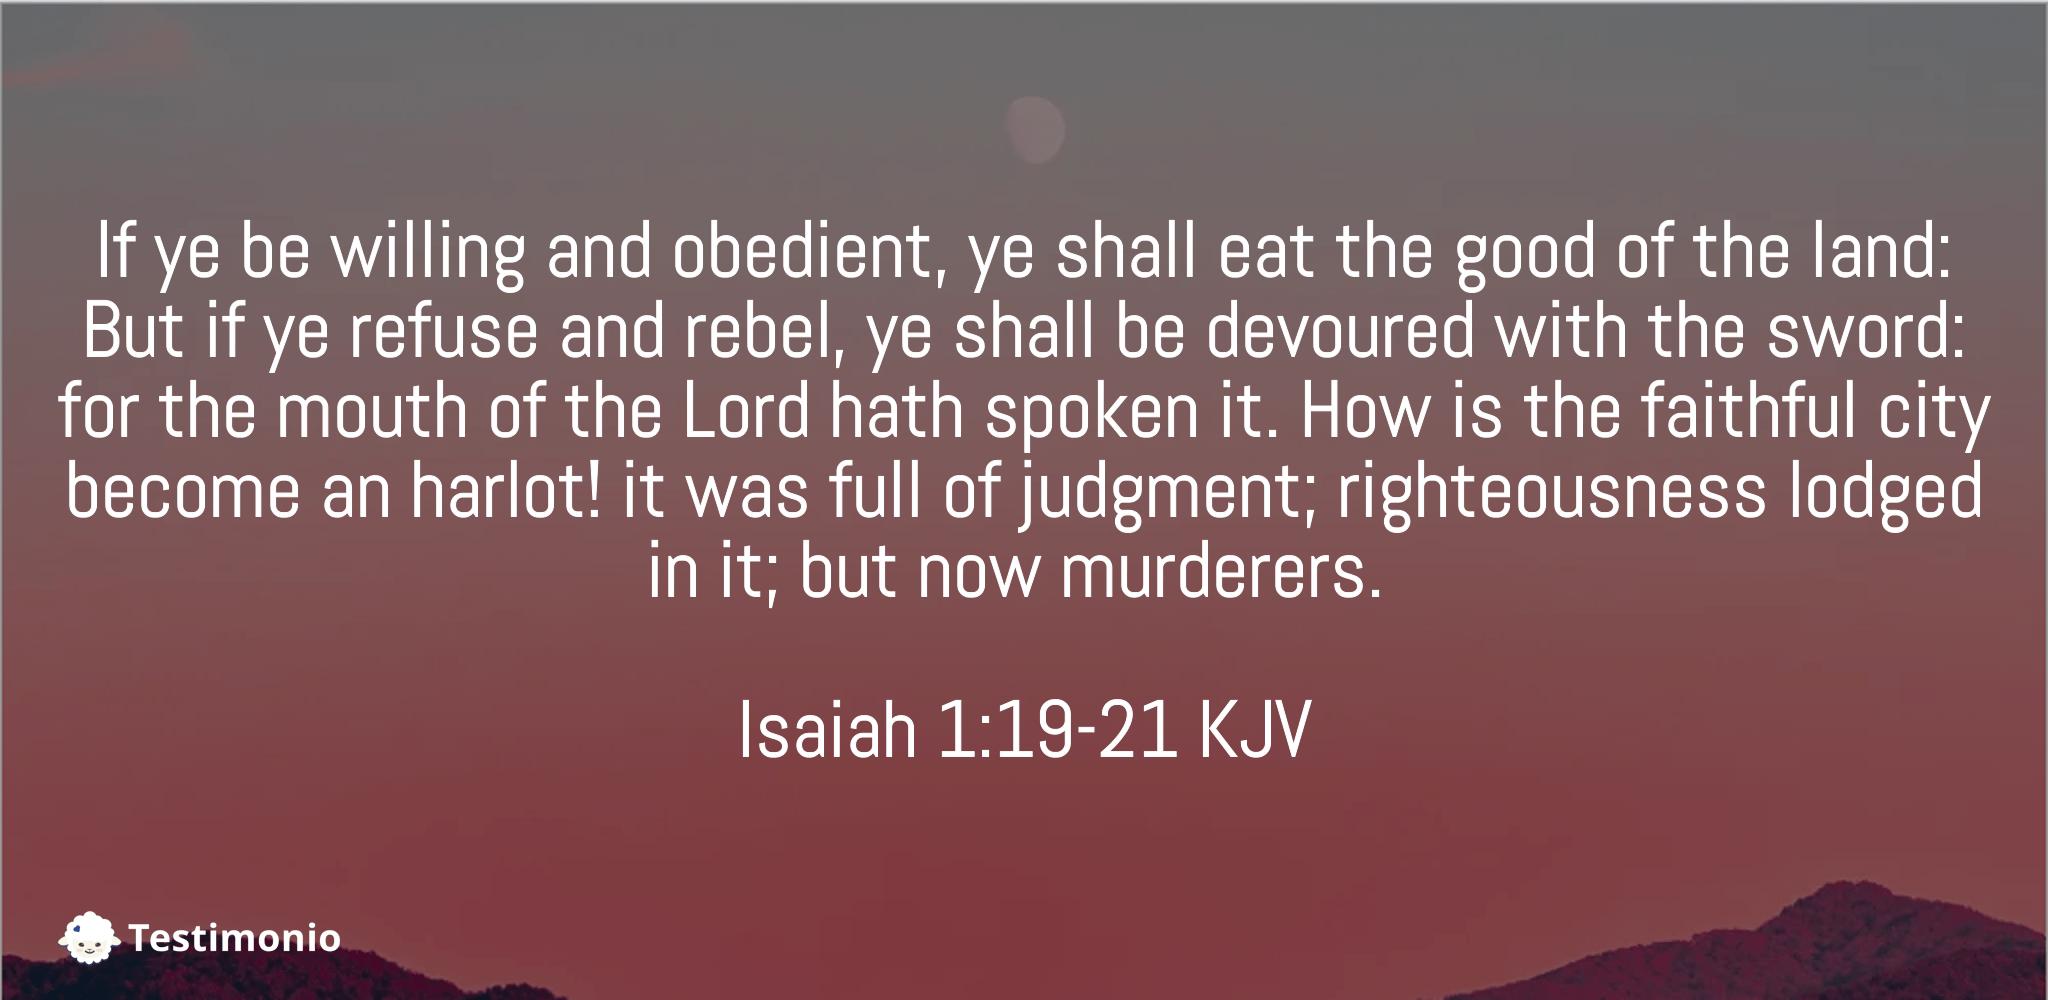 Isaiah 1:19-21